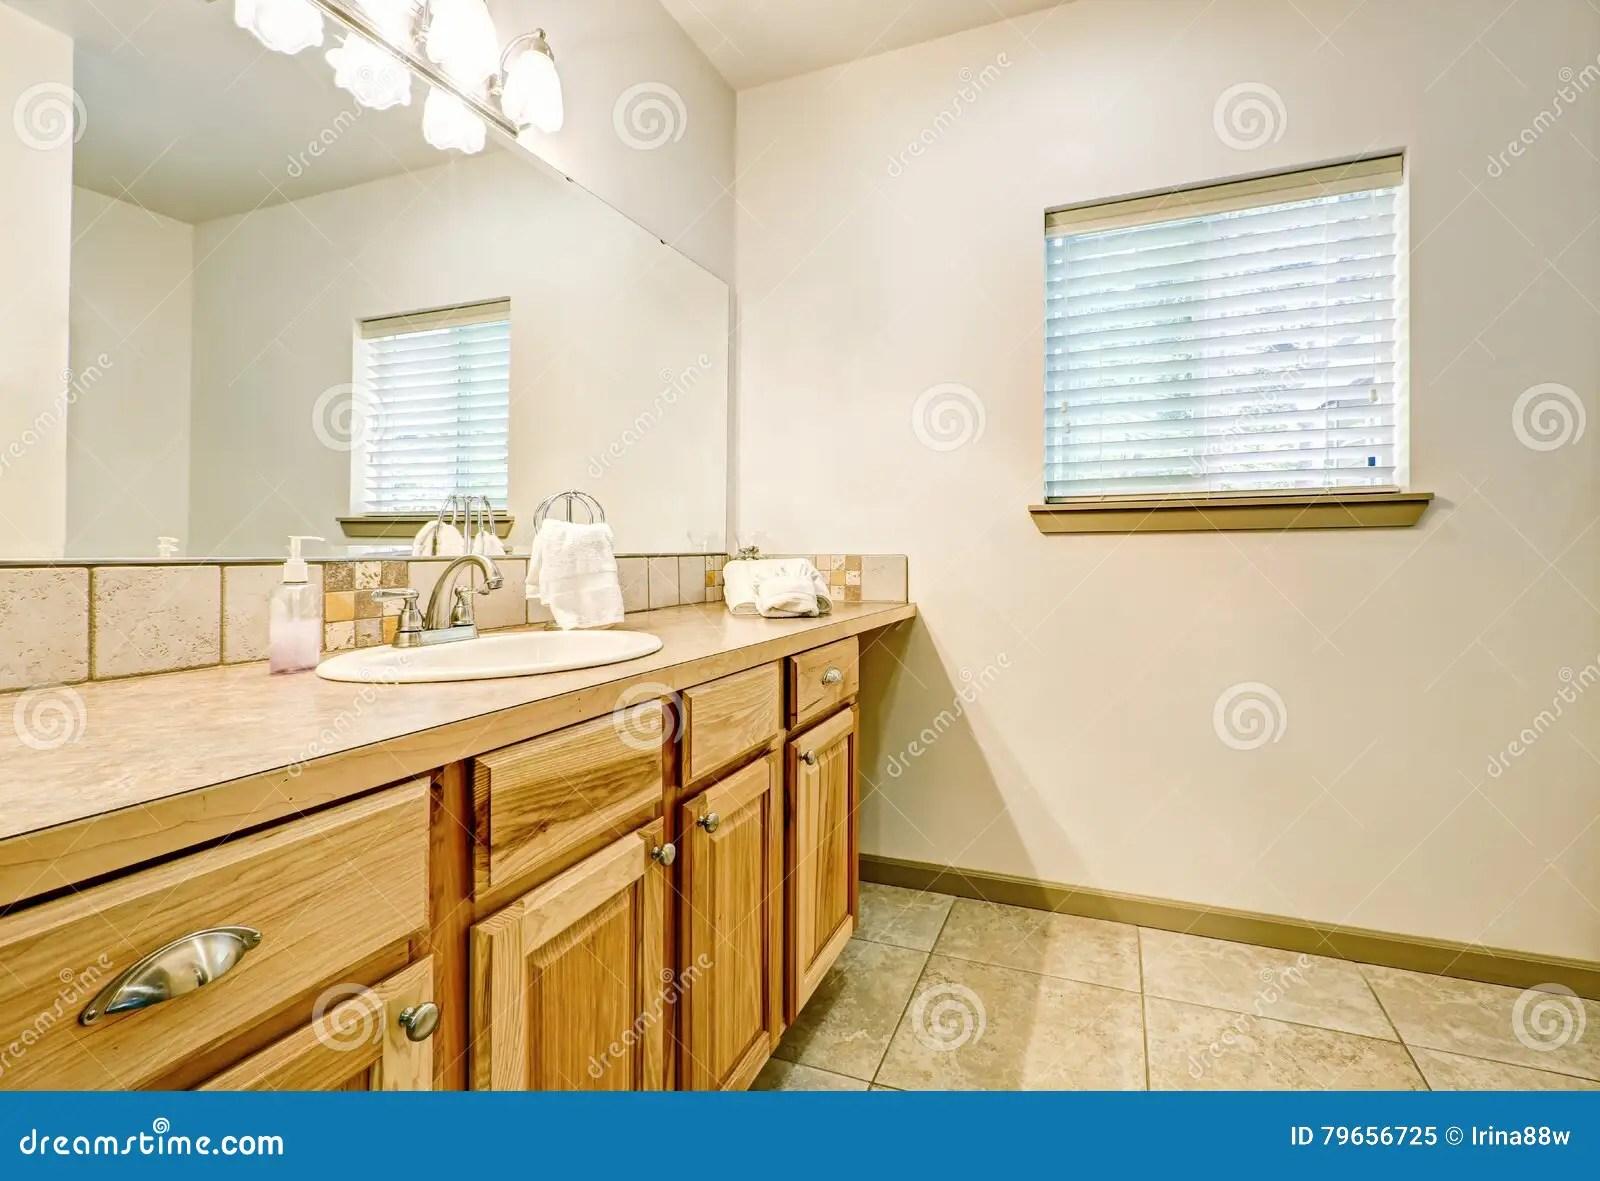 Bathroom Vanity Made Of Natural Wood Stock Image Image Of Indoor Simple 79656725